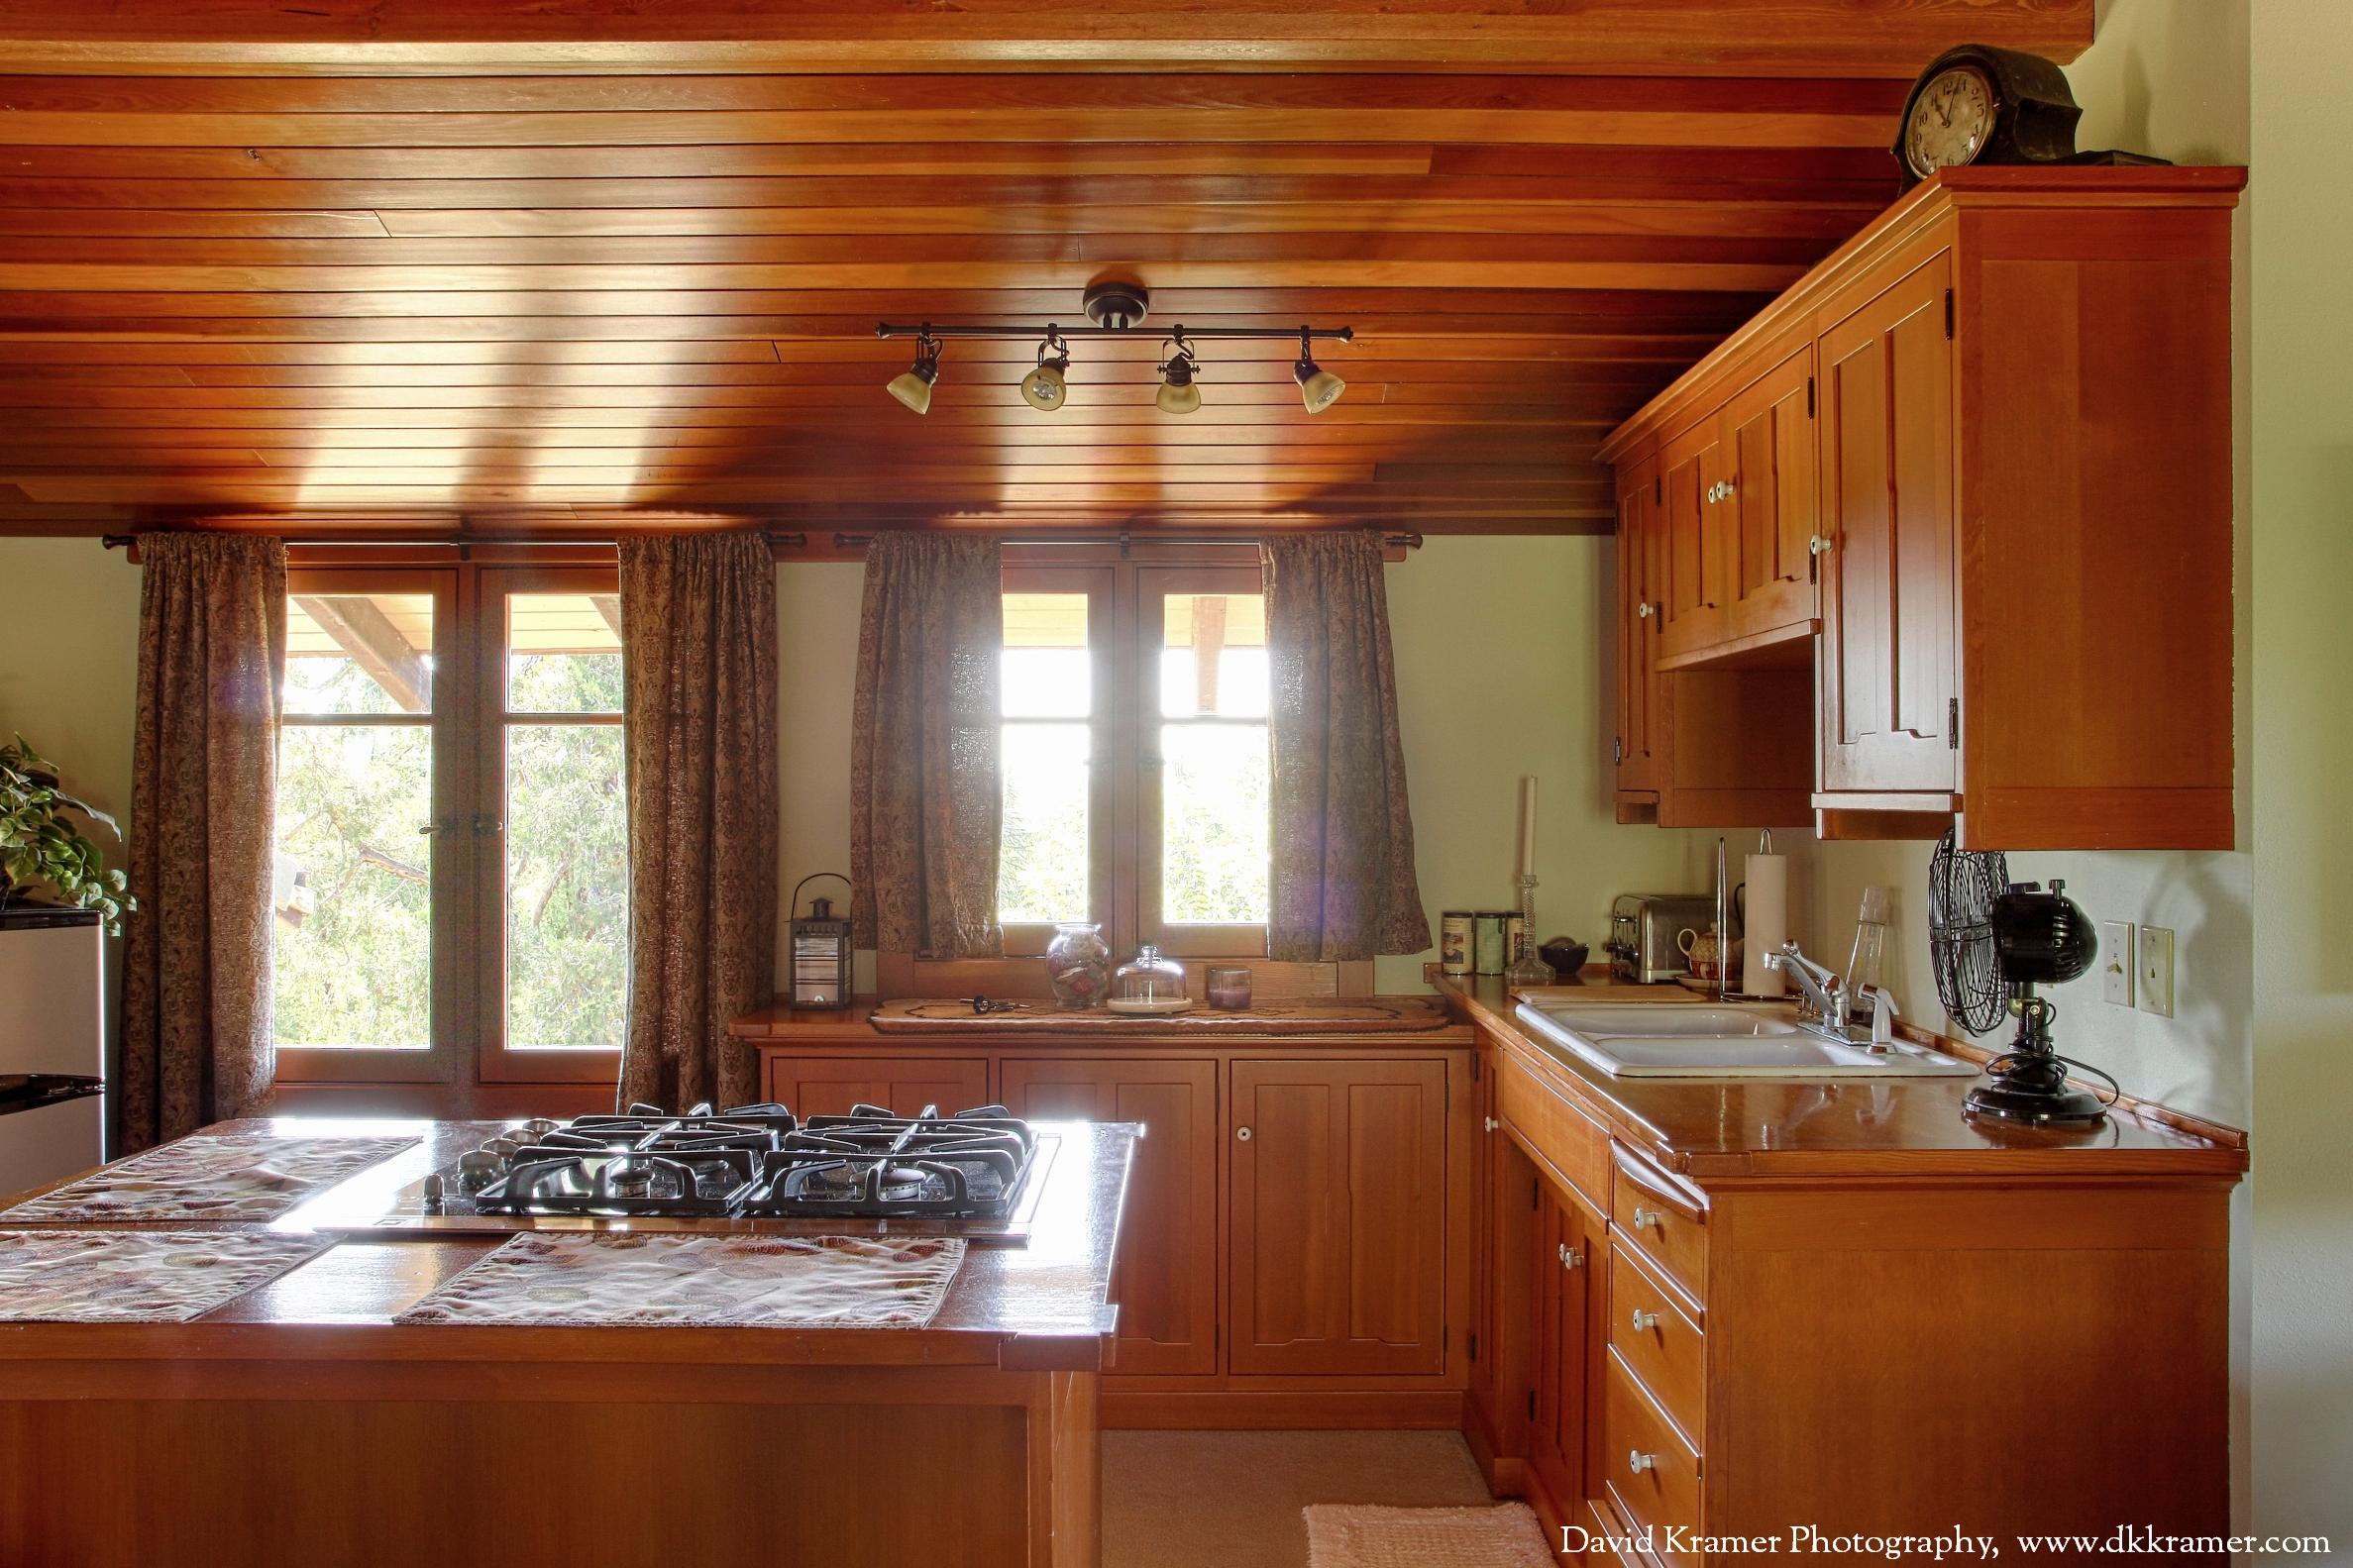 DKP - Lilac Guest House 06.jpg